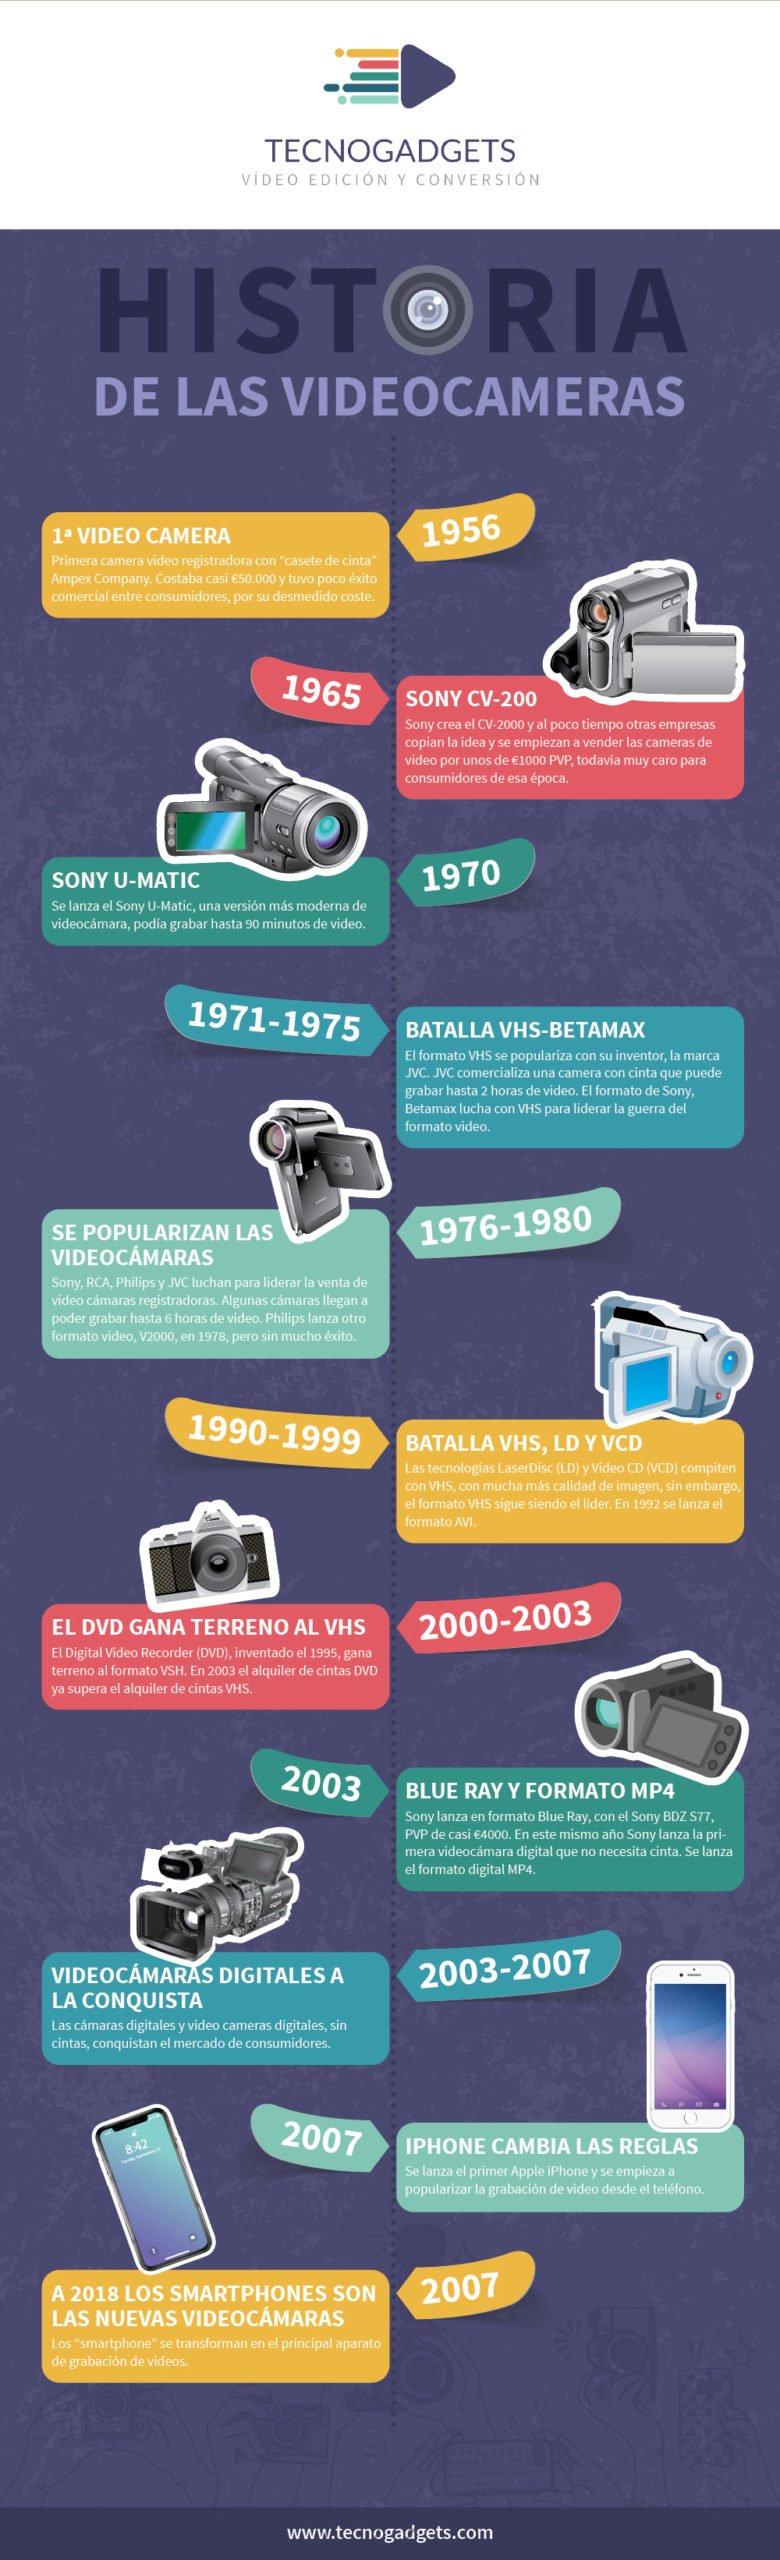 Infografía Tecnogadgets-Infographic